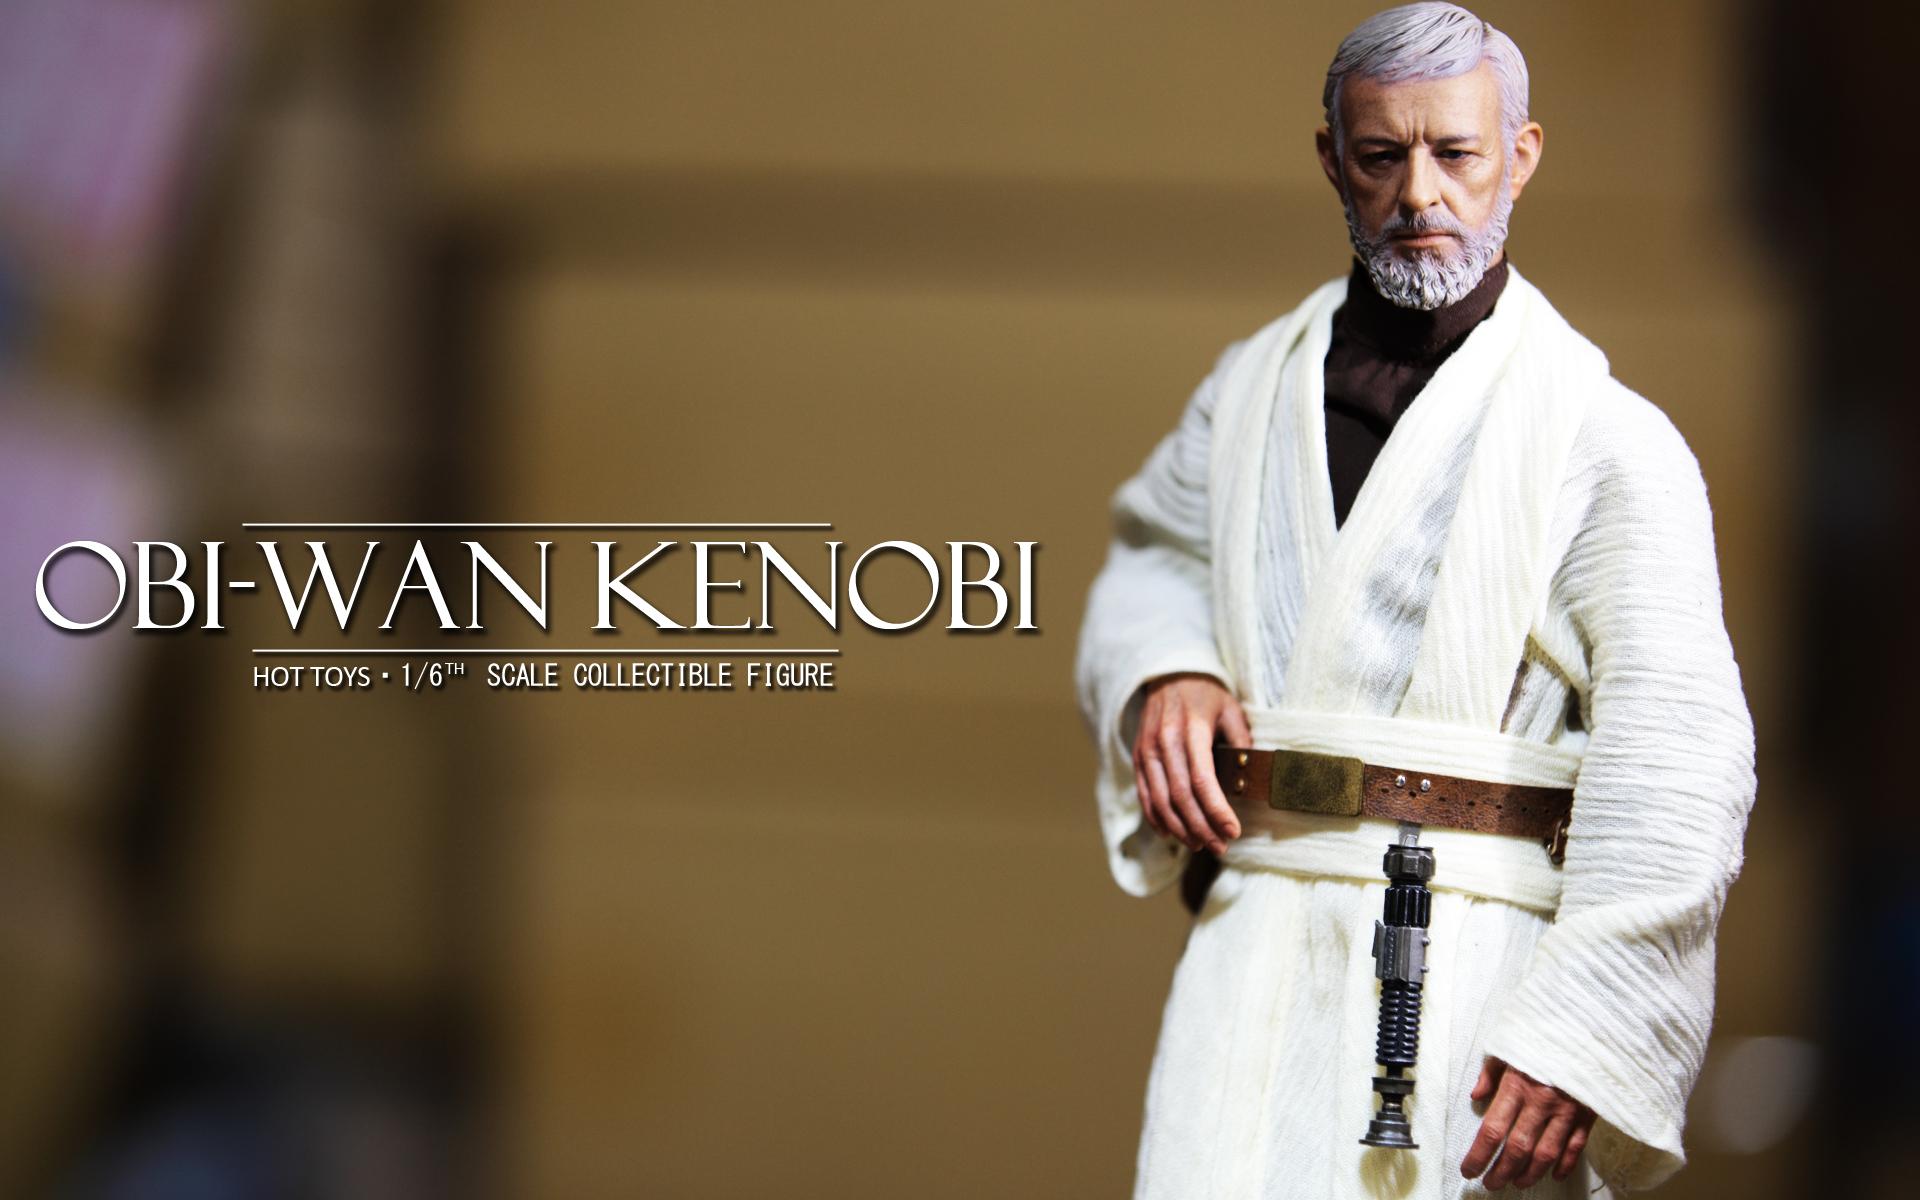 hottoys-star-wars-episode-IV-a-new-hope-obi-wan-kenobi-picture09